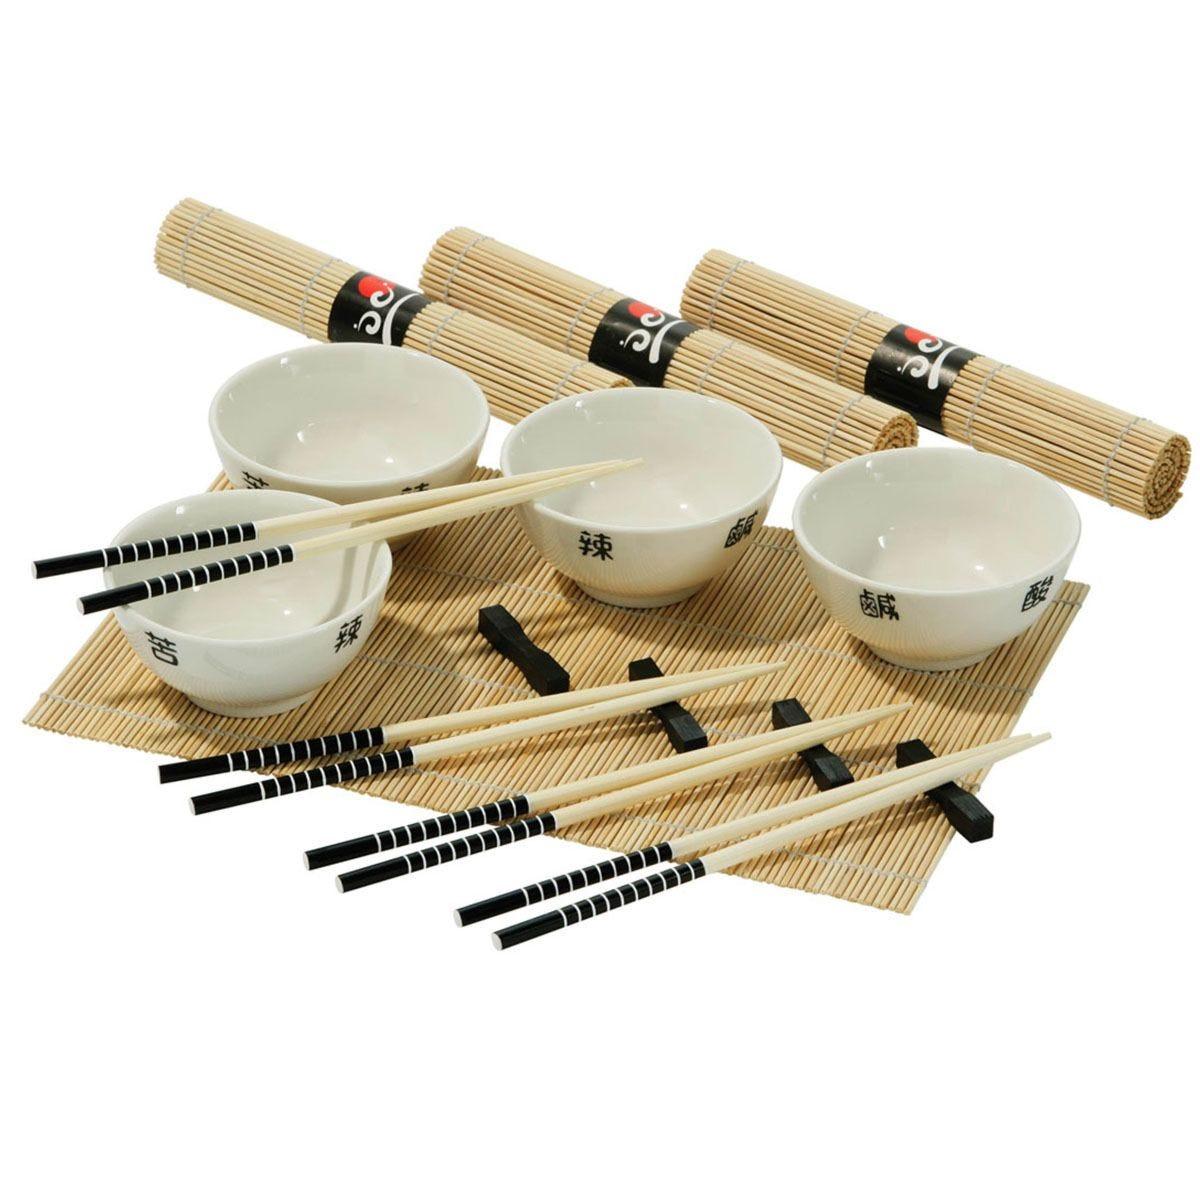 Premier Housewares 16-Piece Chinese Dining Set